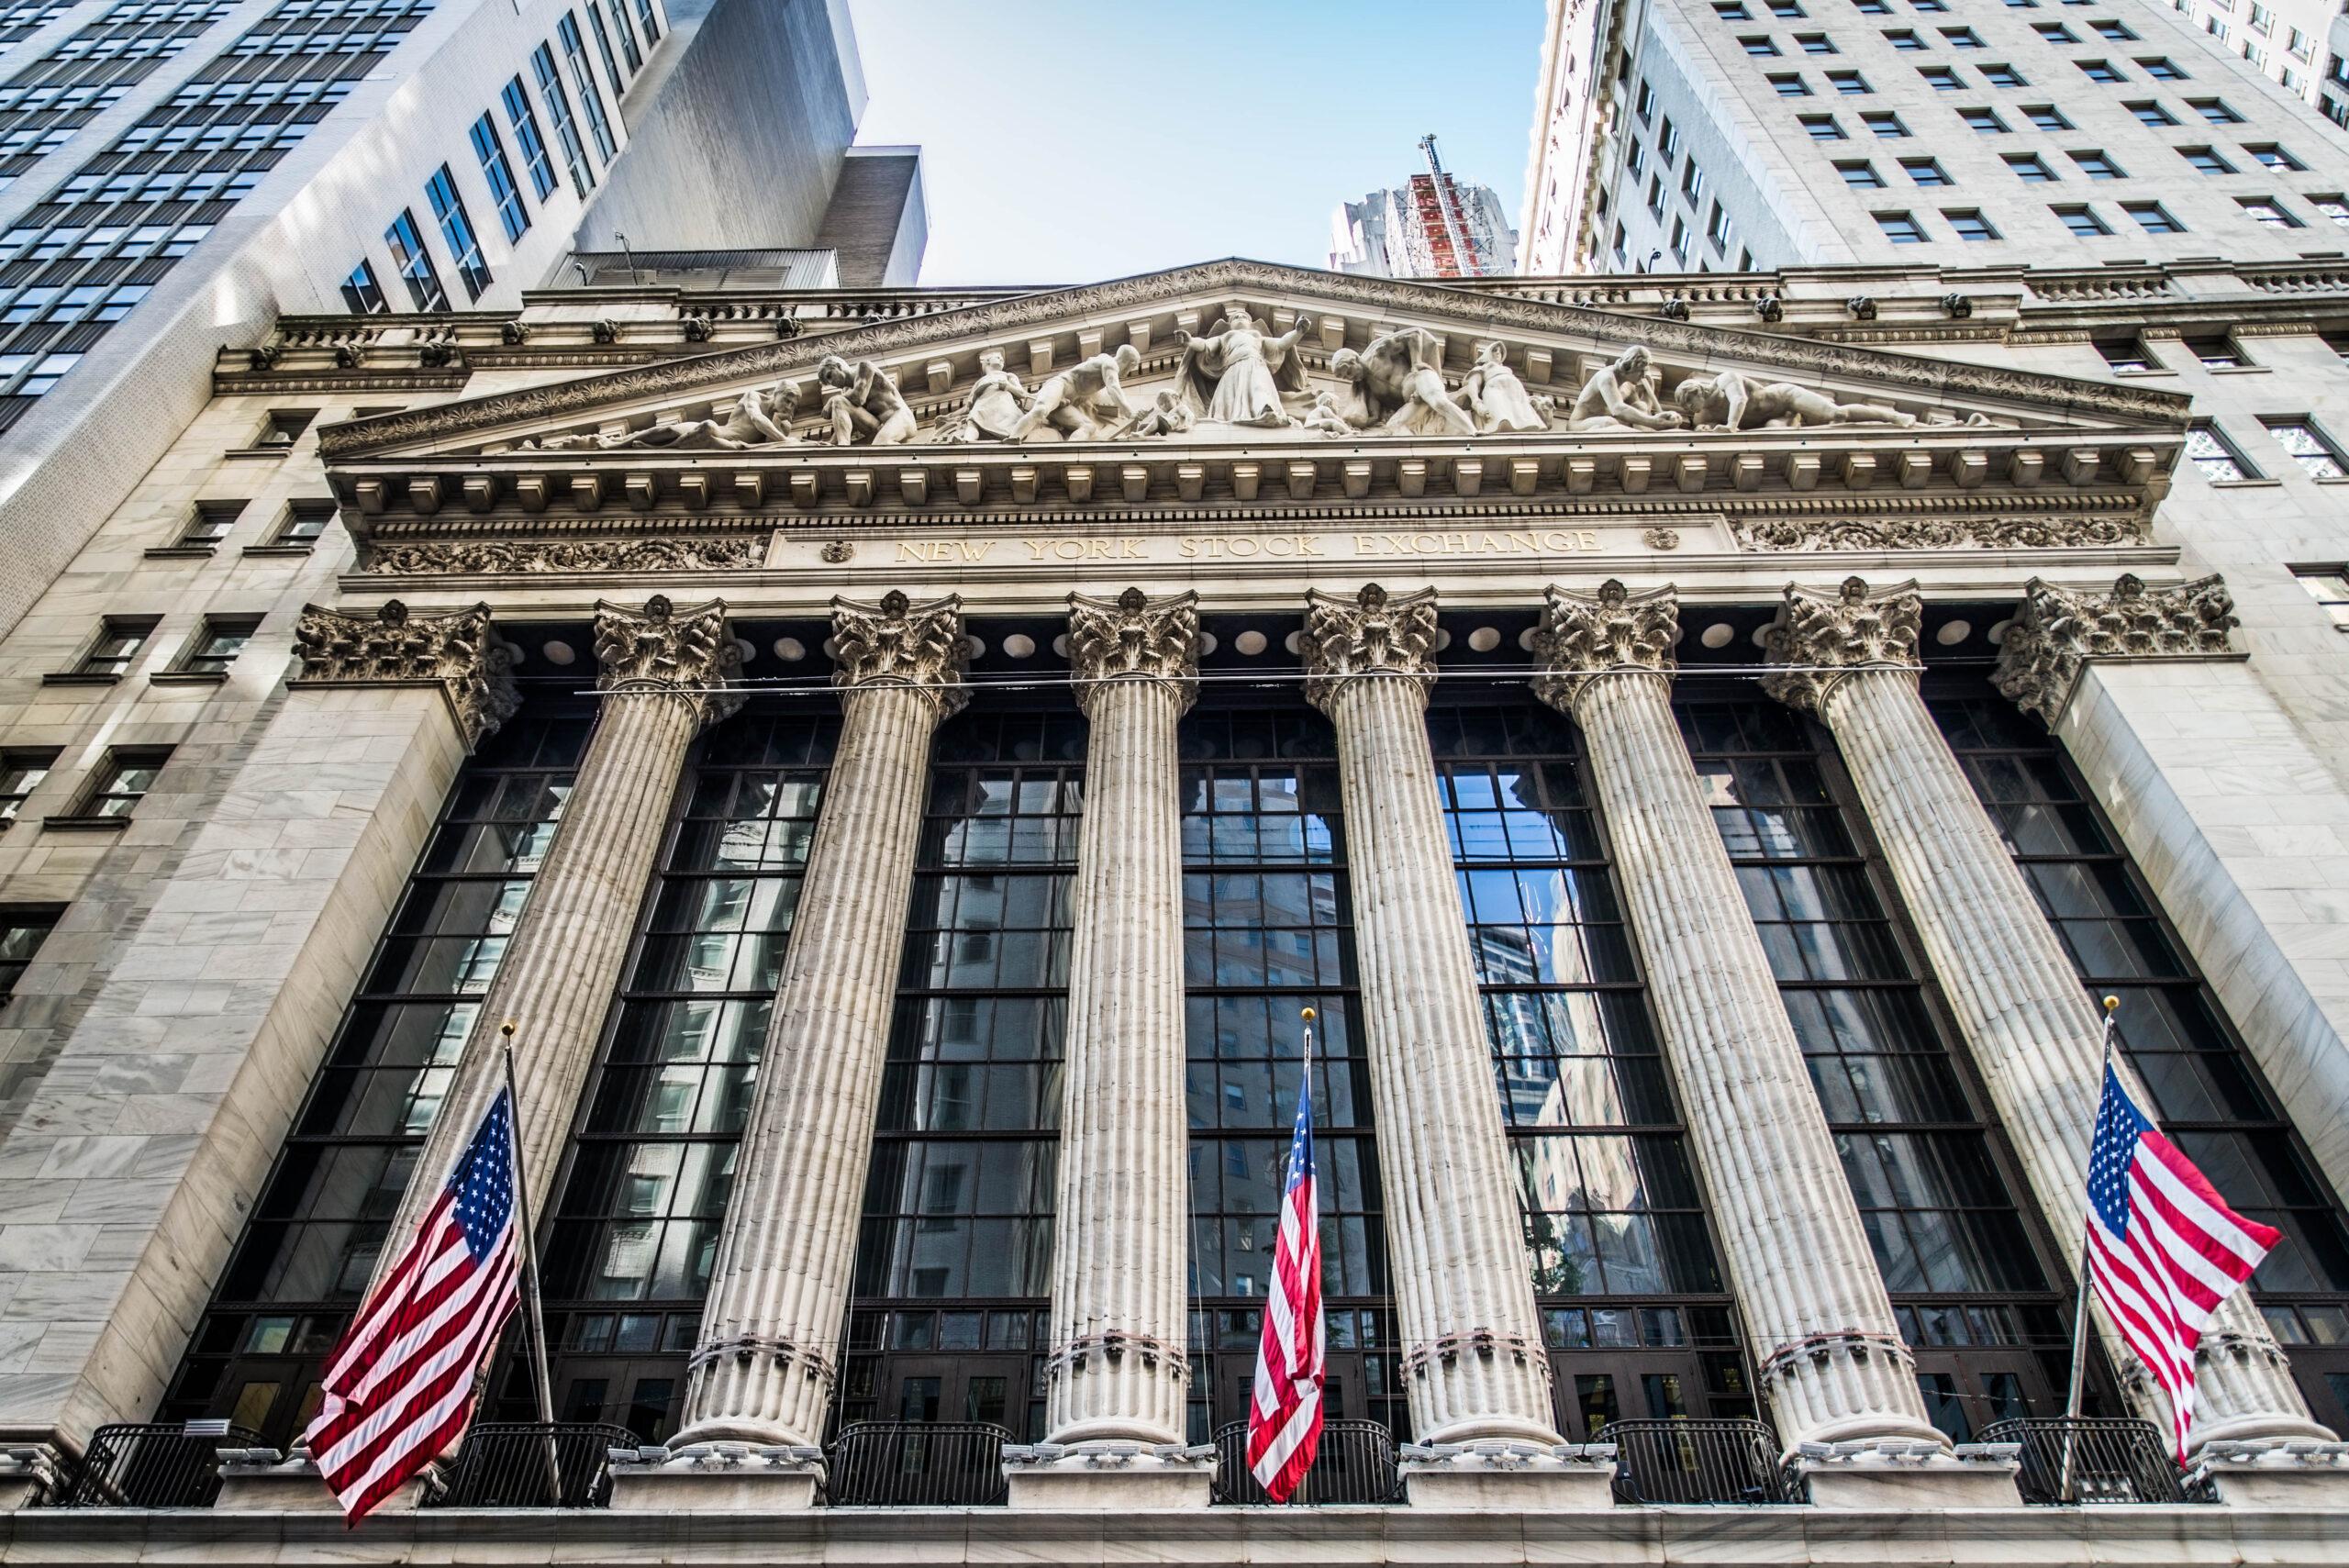 ProSharesのビットコイン先物ETF、19日にNYSEで取引開始【更新】